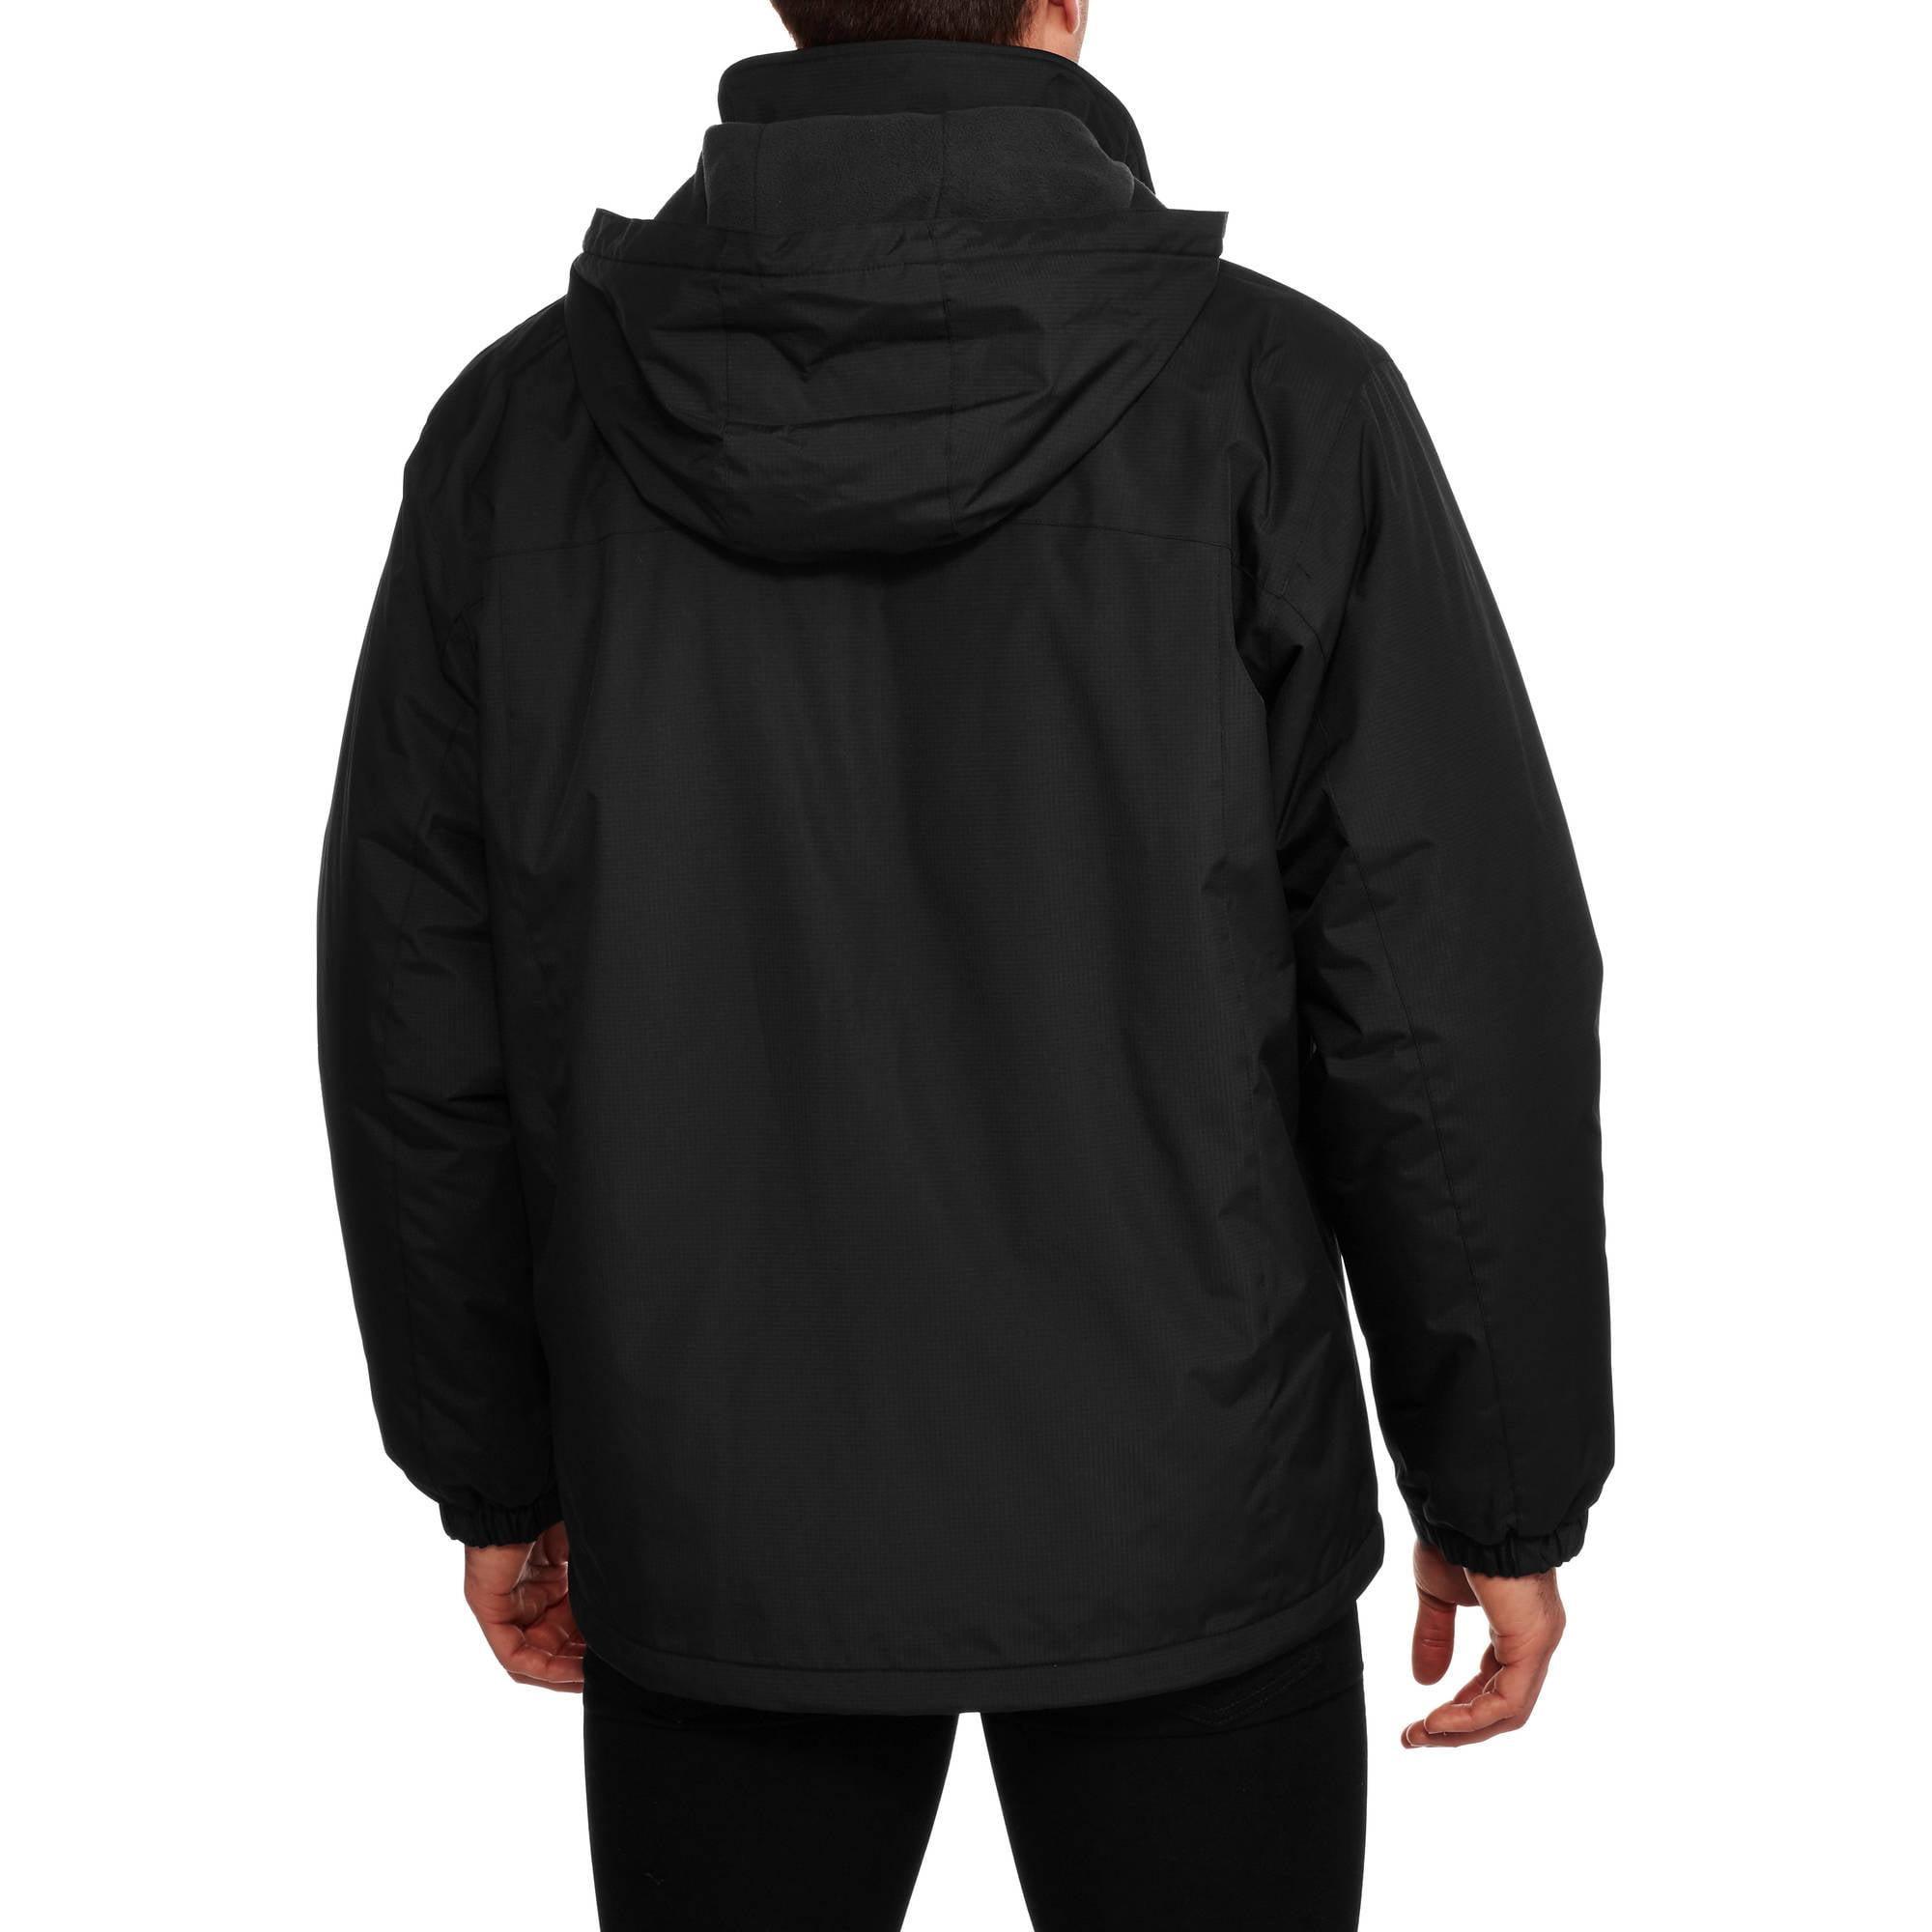 f74ec4cca Men's 3-in-1 System Jacket